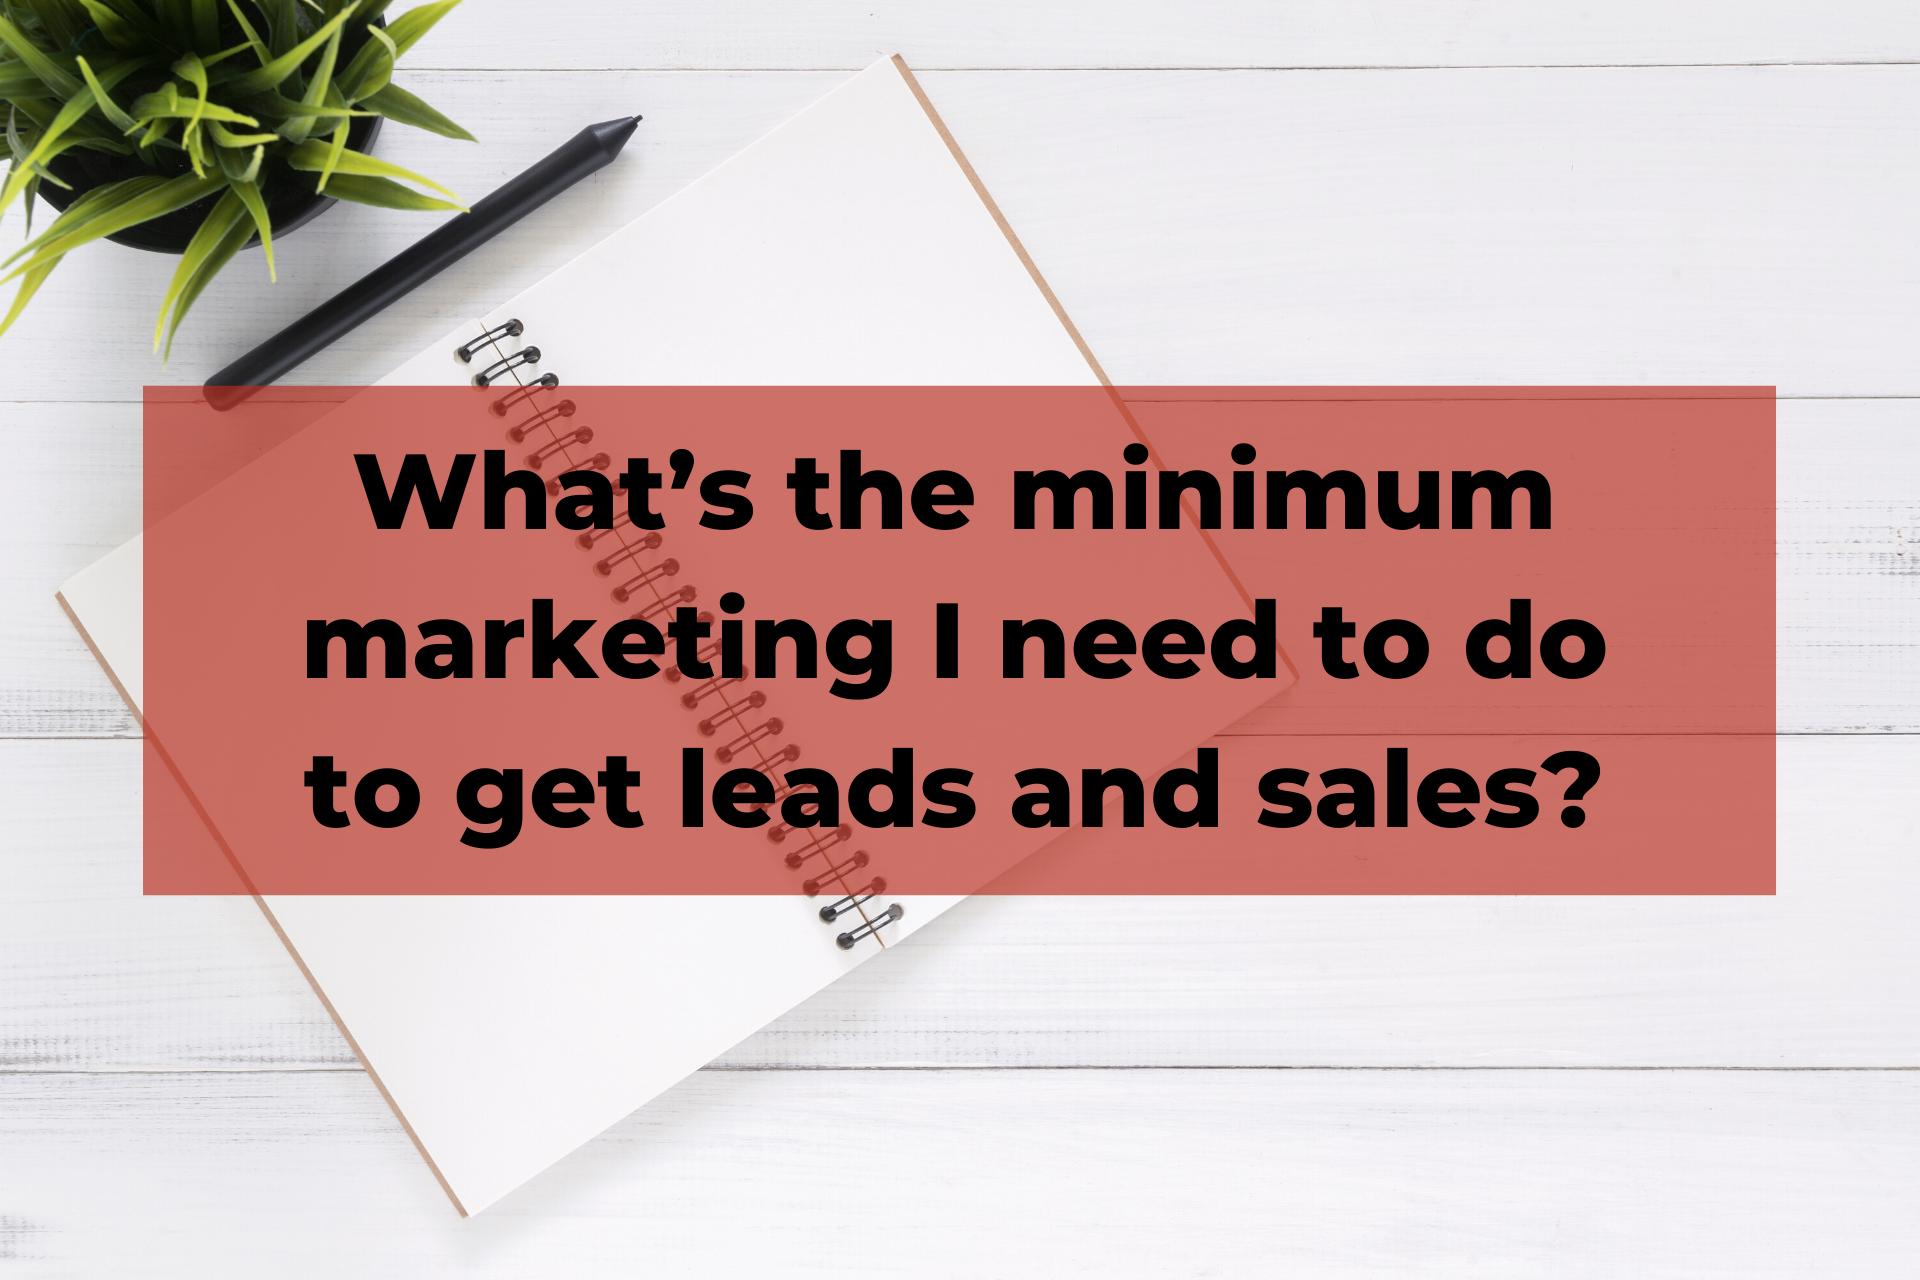 Minimum marketing